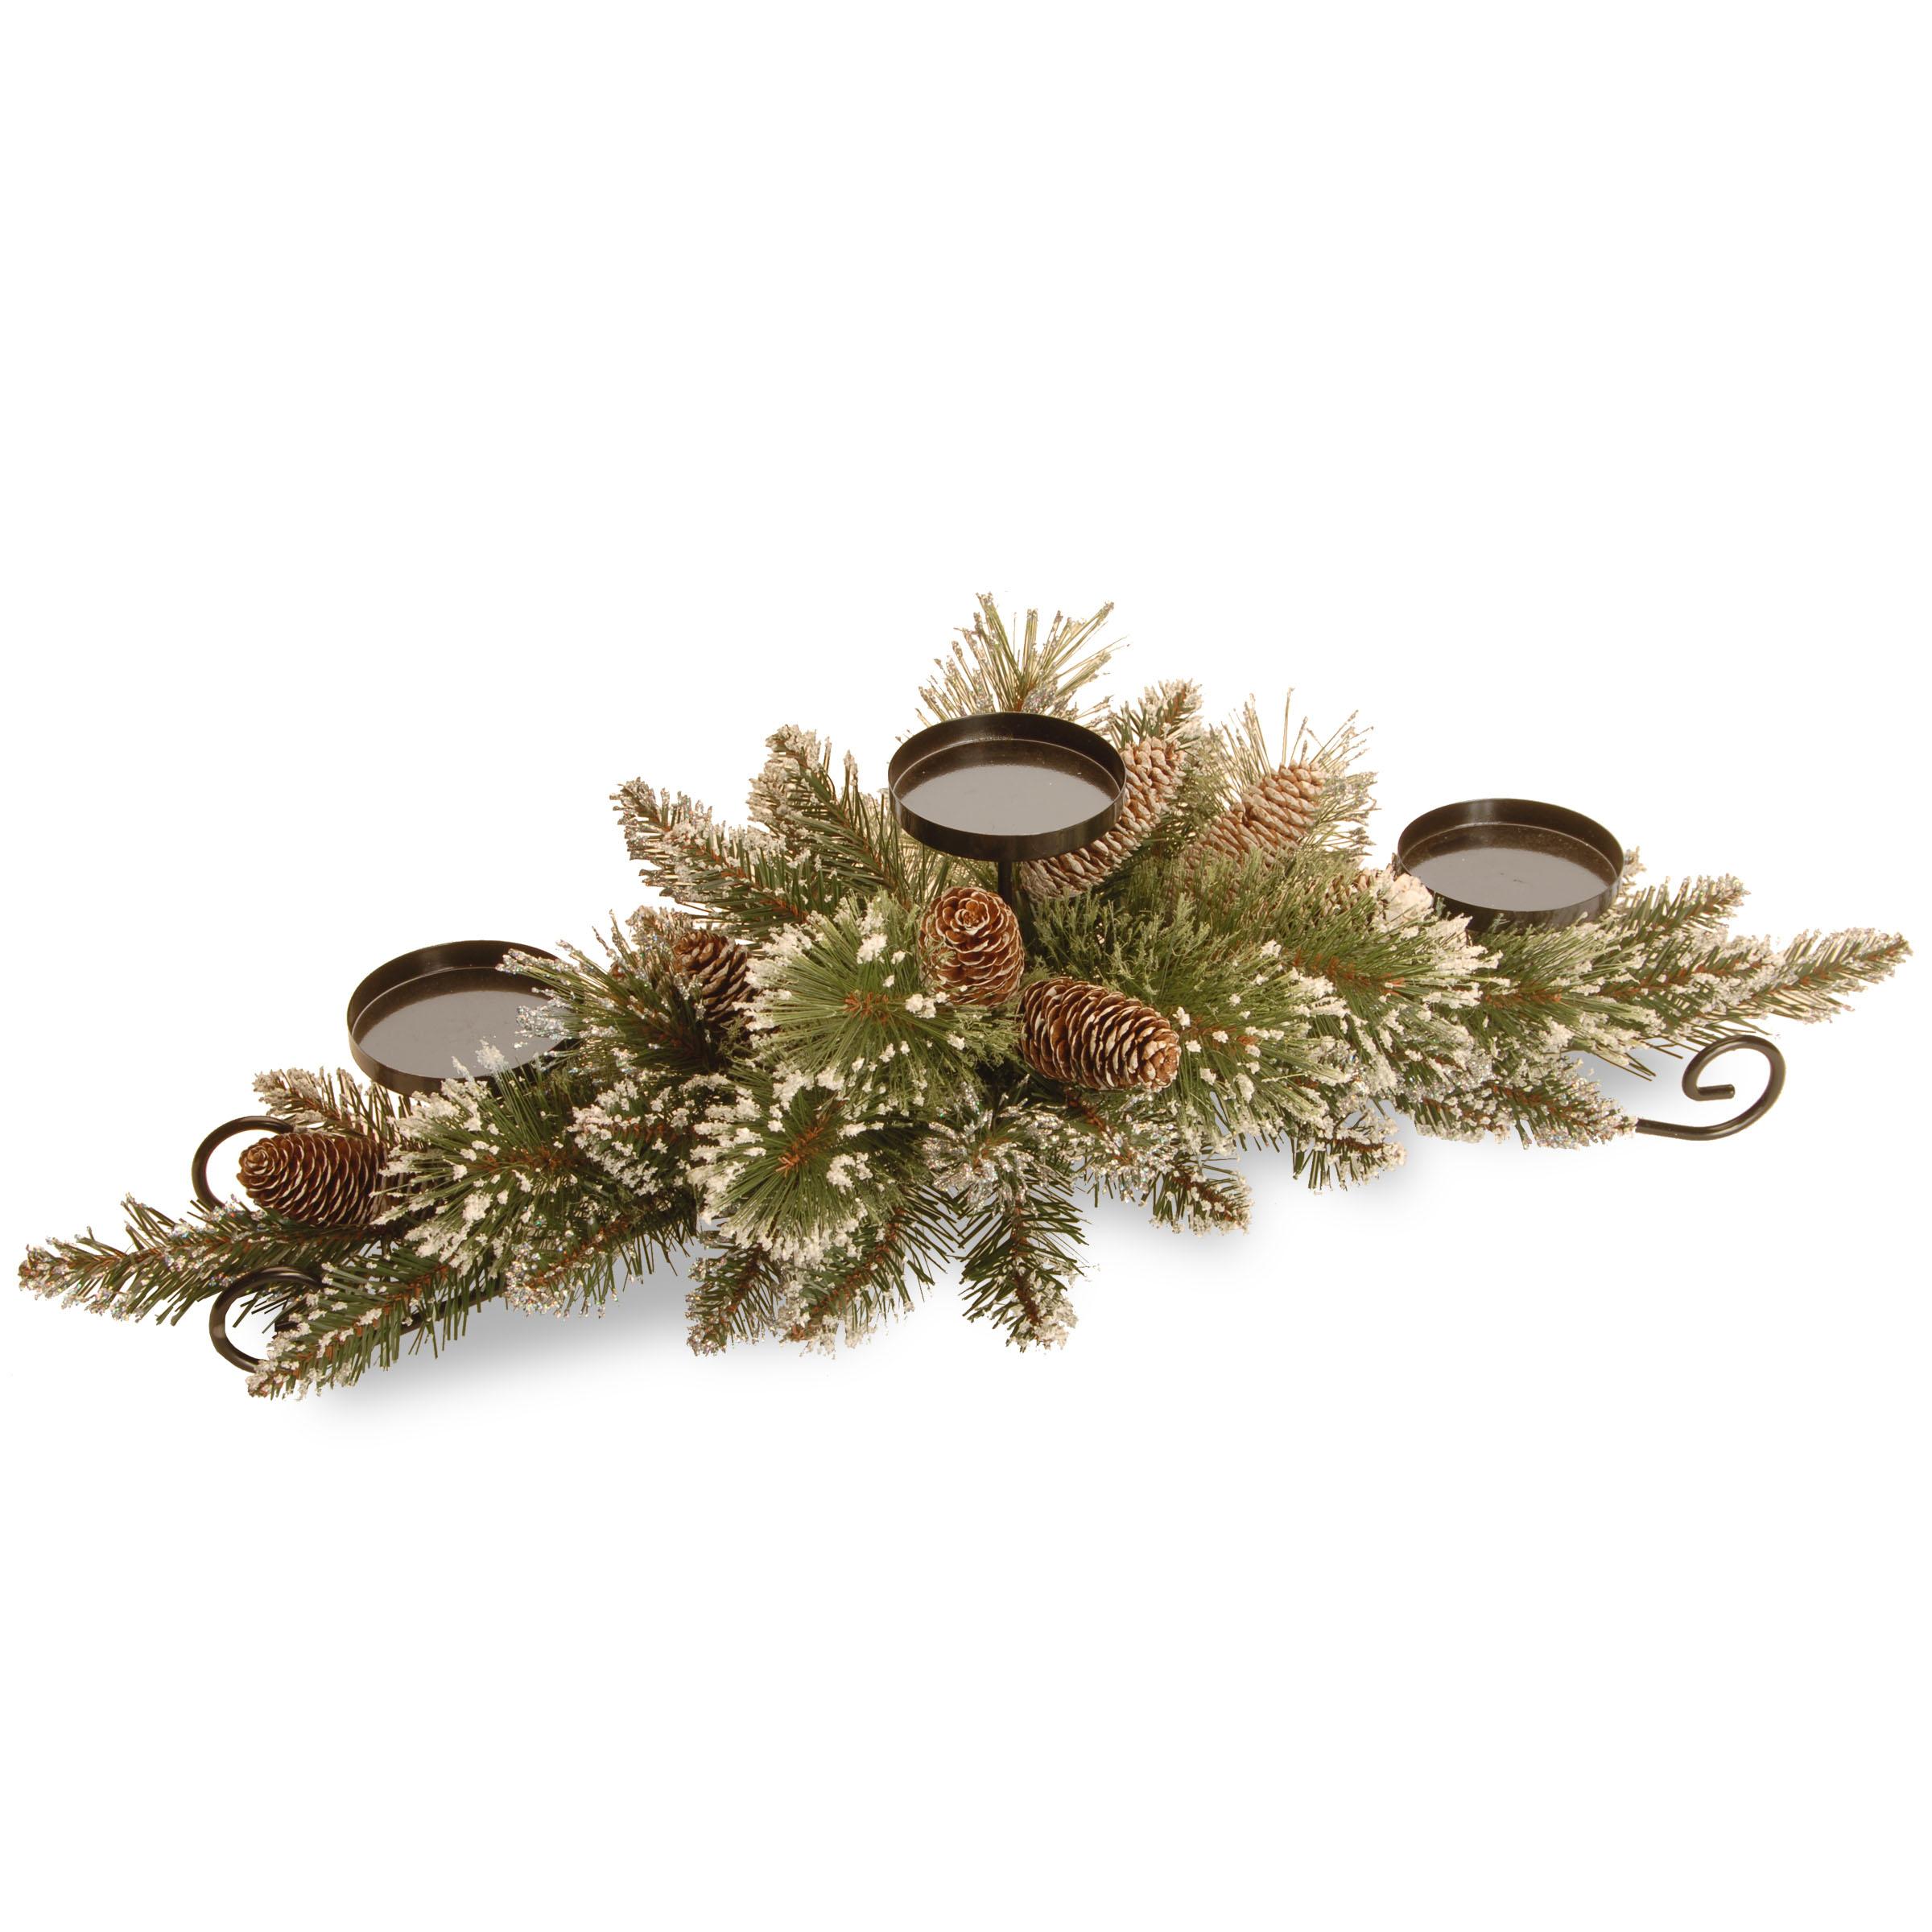 30 inch Glittery Bristle Pine Centerpiece: 3 Candle Holders/Cones GB3-810-30C-B